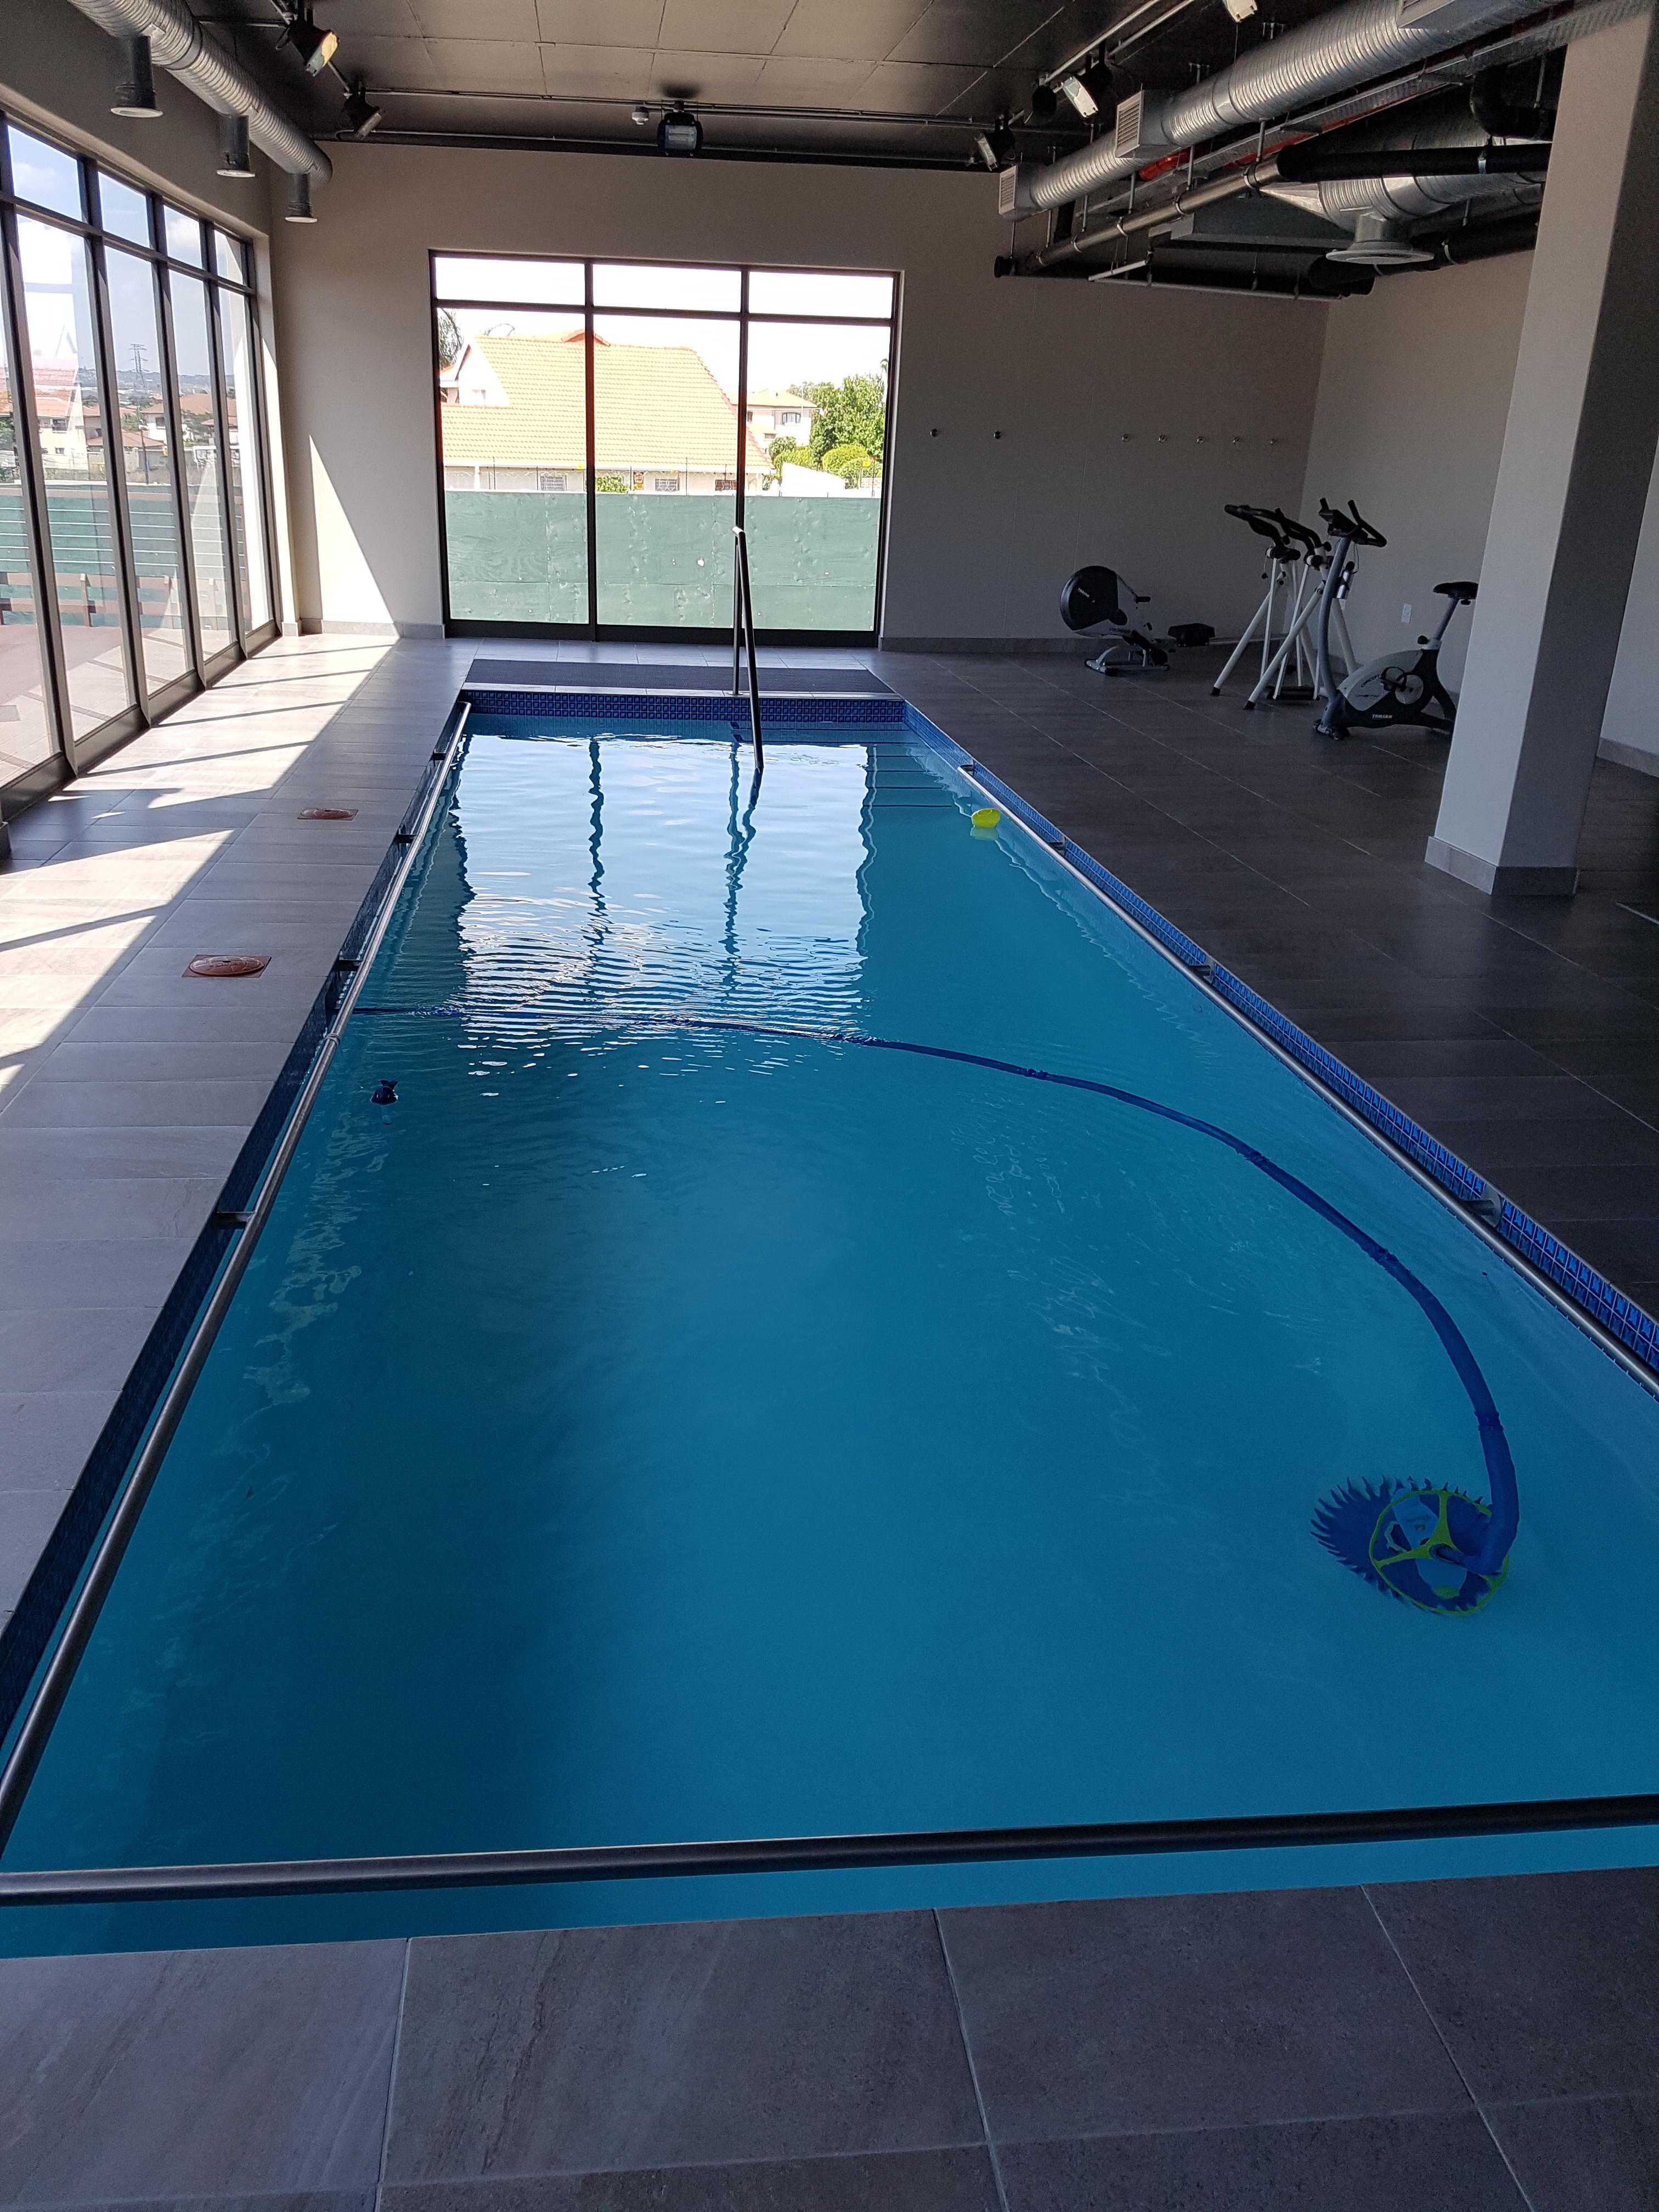 Public pools blue lagoon pools - Evergreen high school swimming pool ...